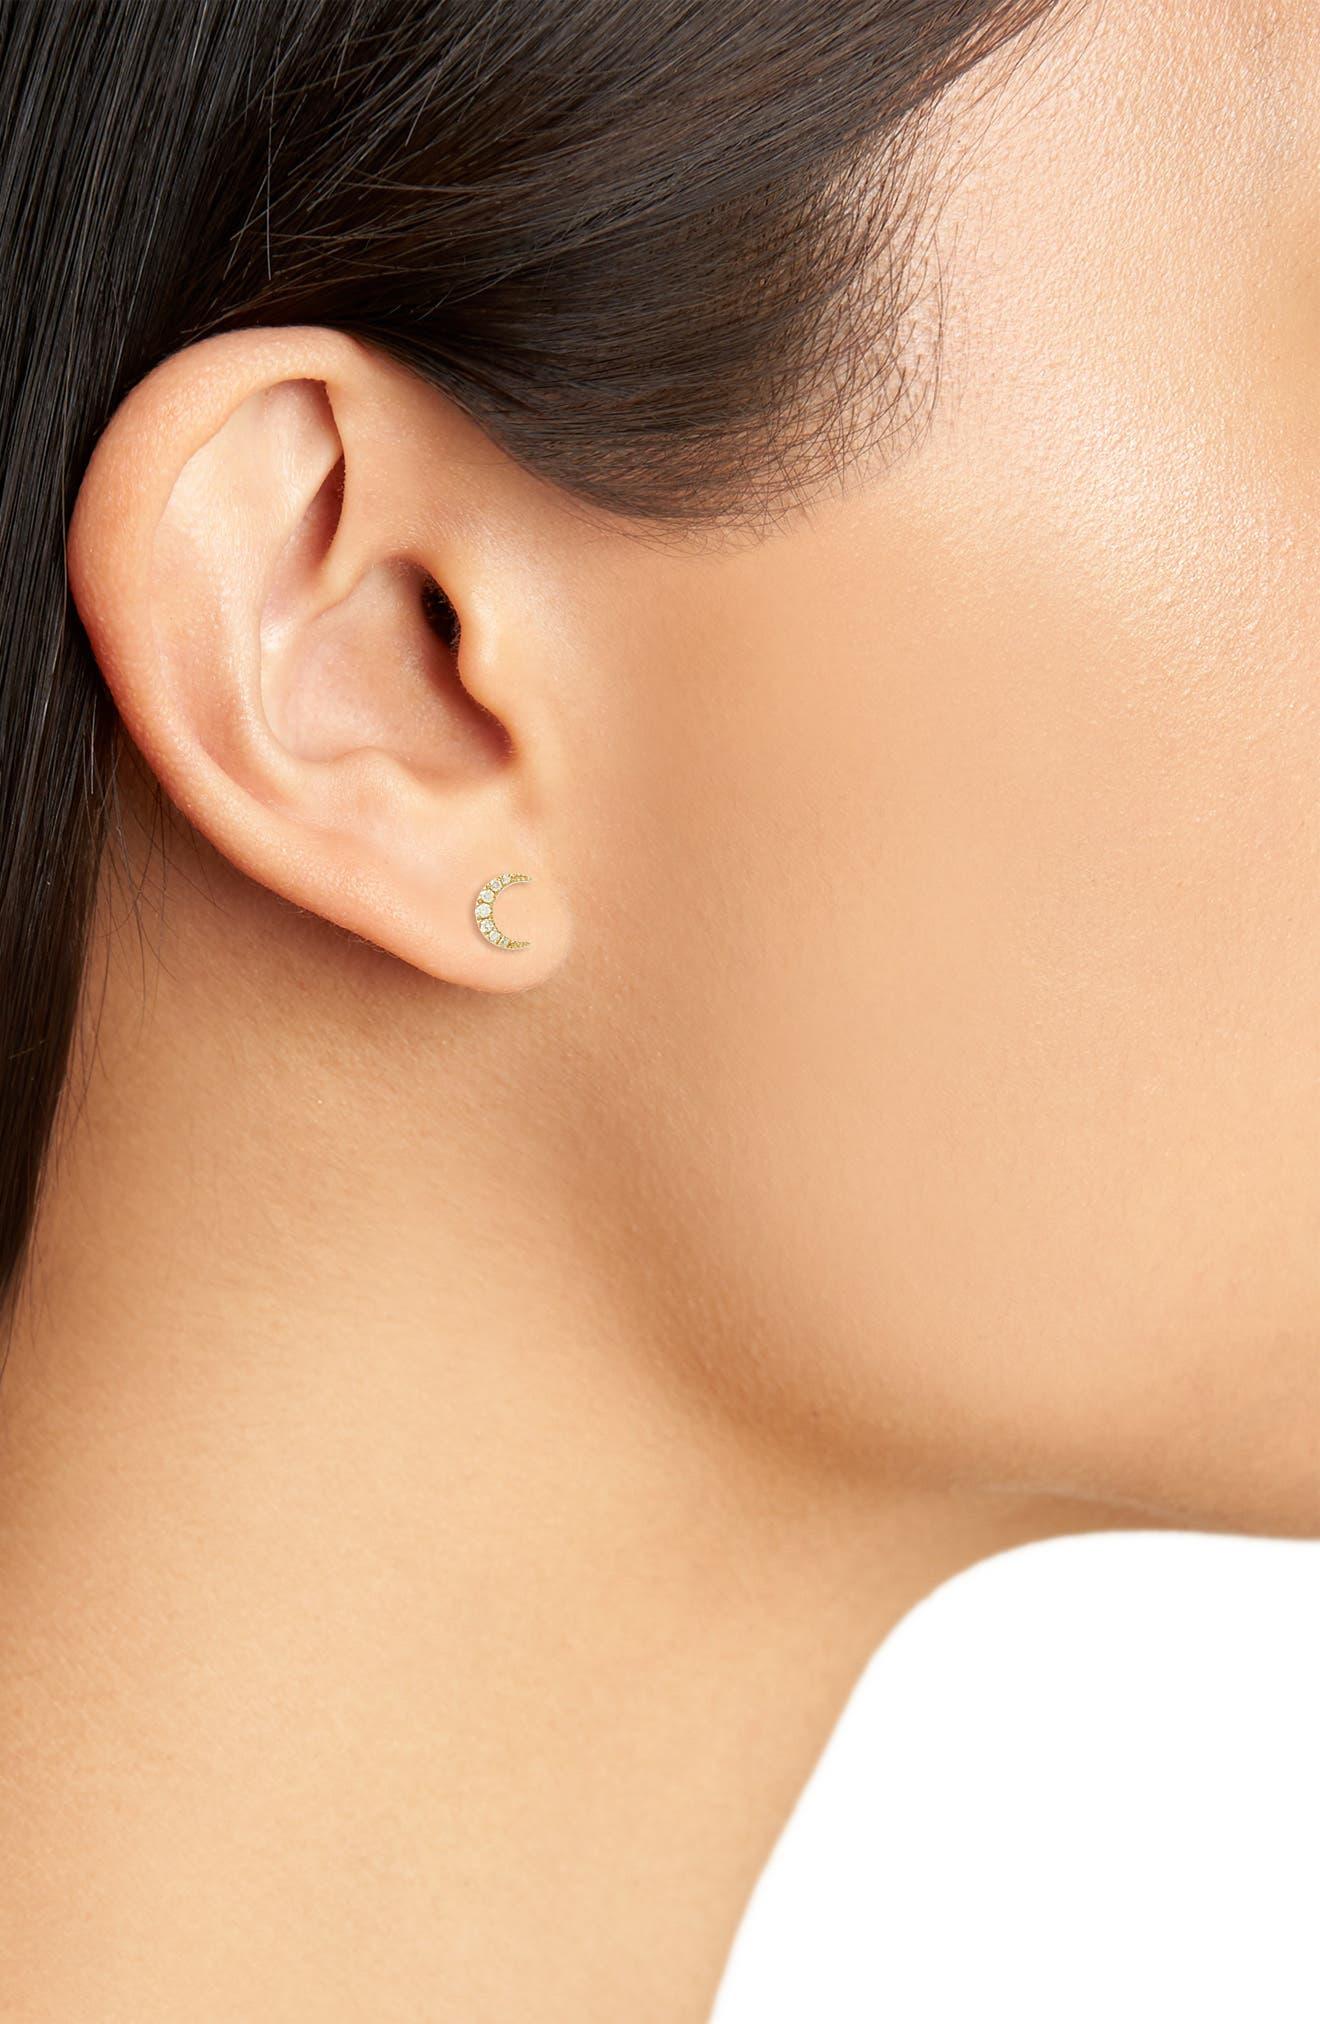 Mini Moon Diamond Stud Earrings,                             Alternate thumbnail 2, color,                             YELLOW GOLD